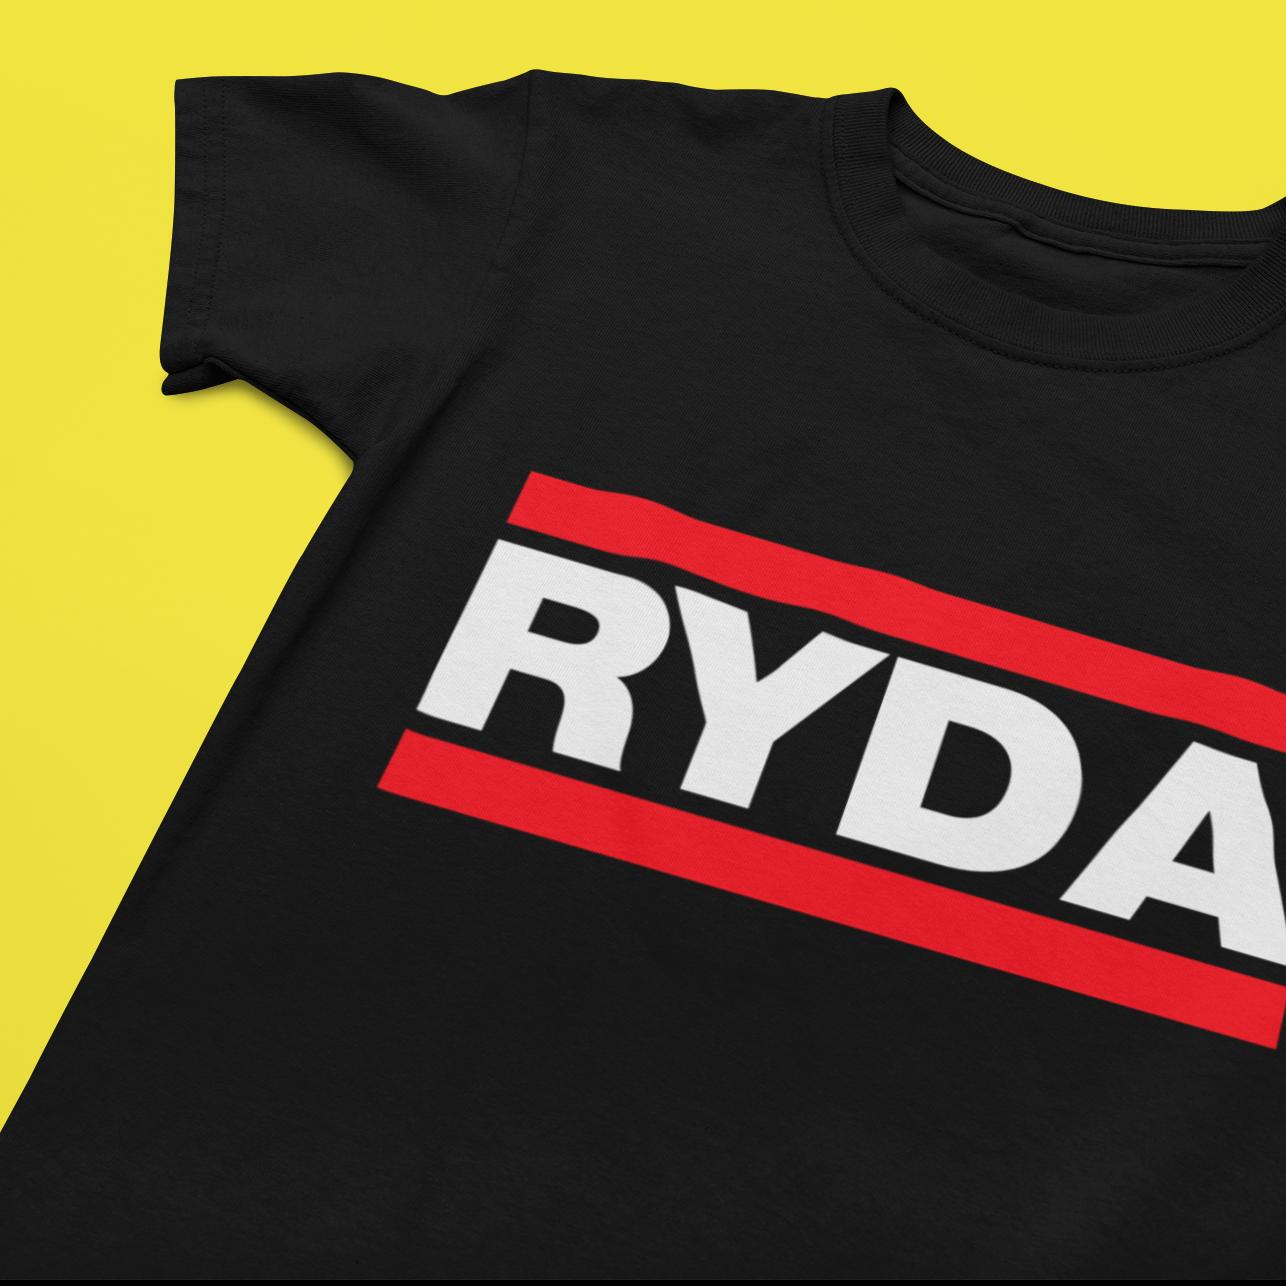 Adult's T-shirts